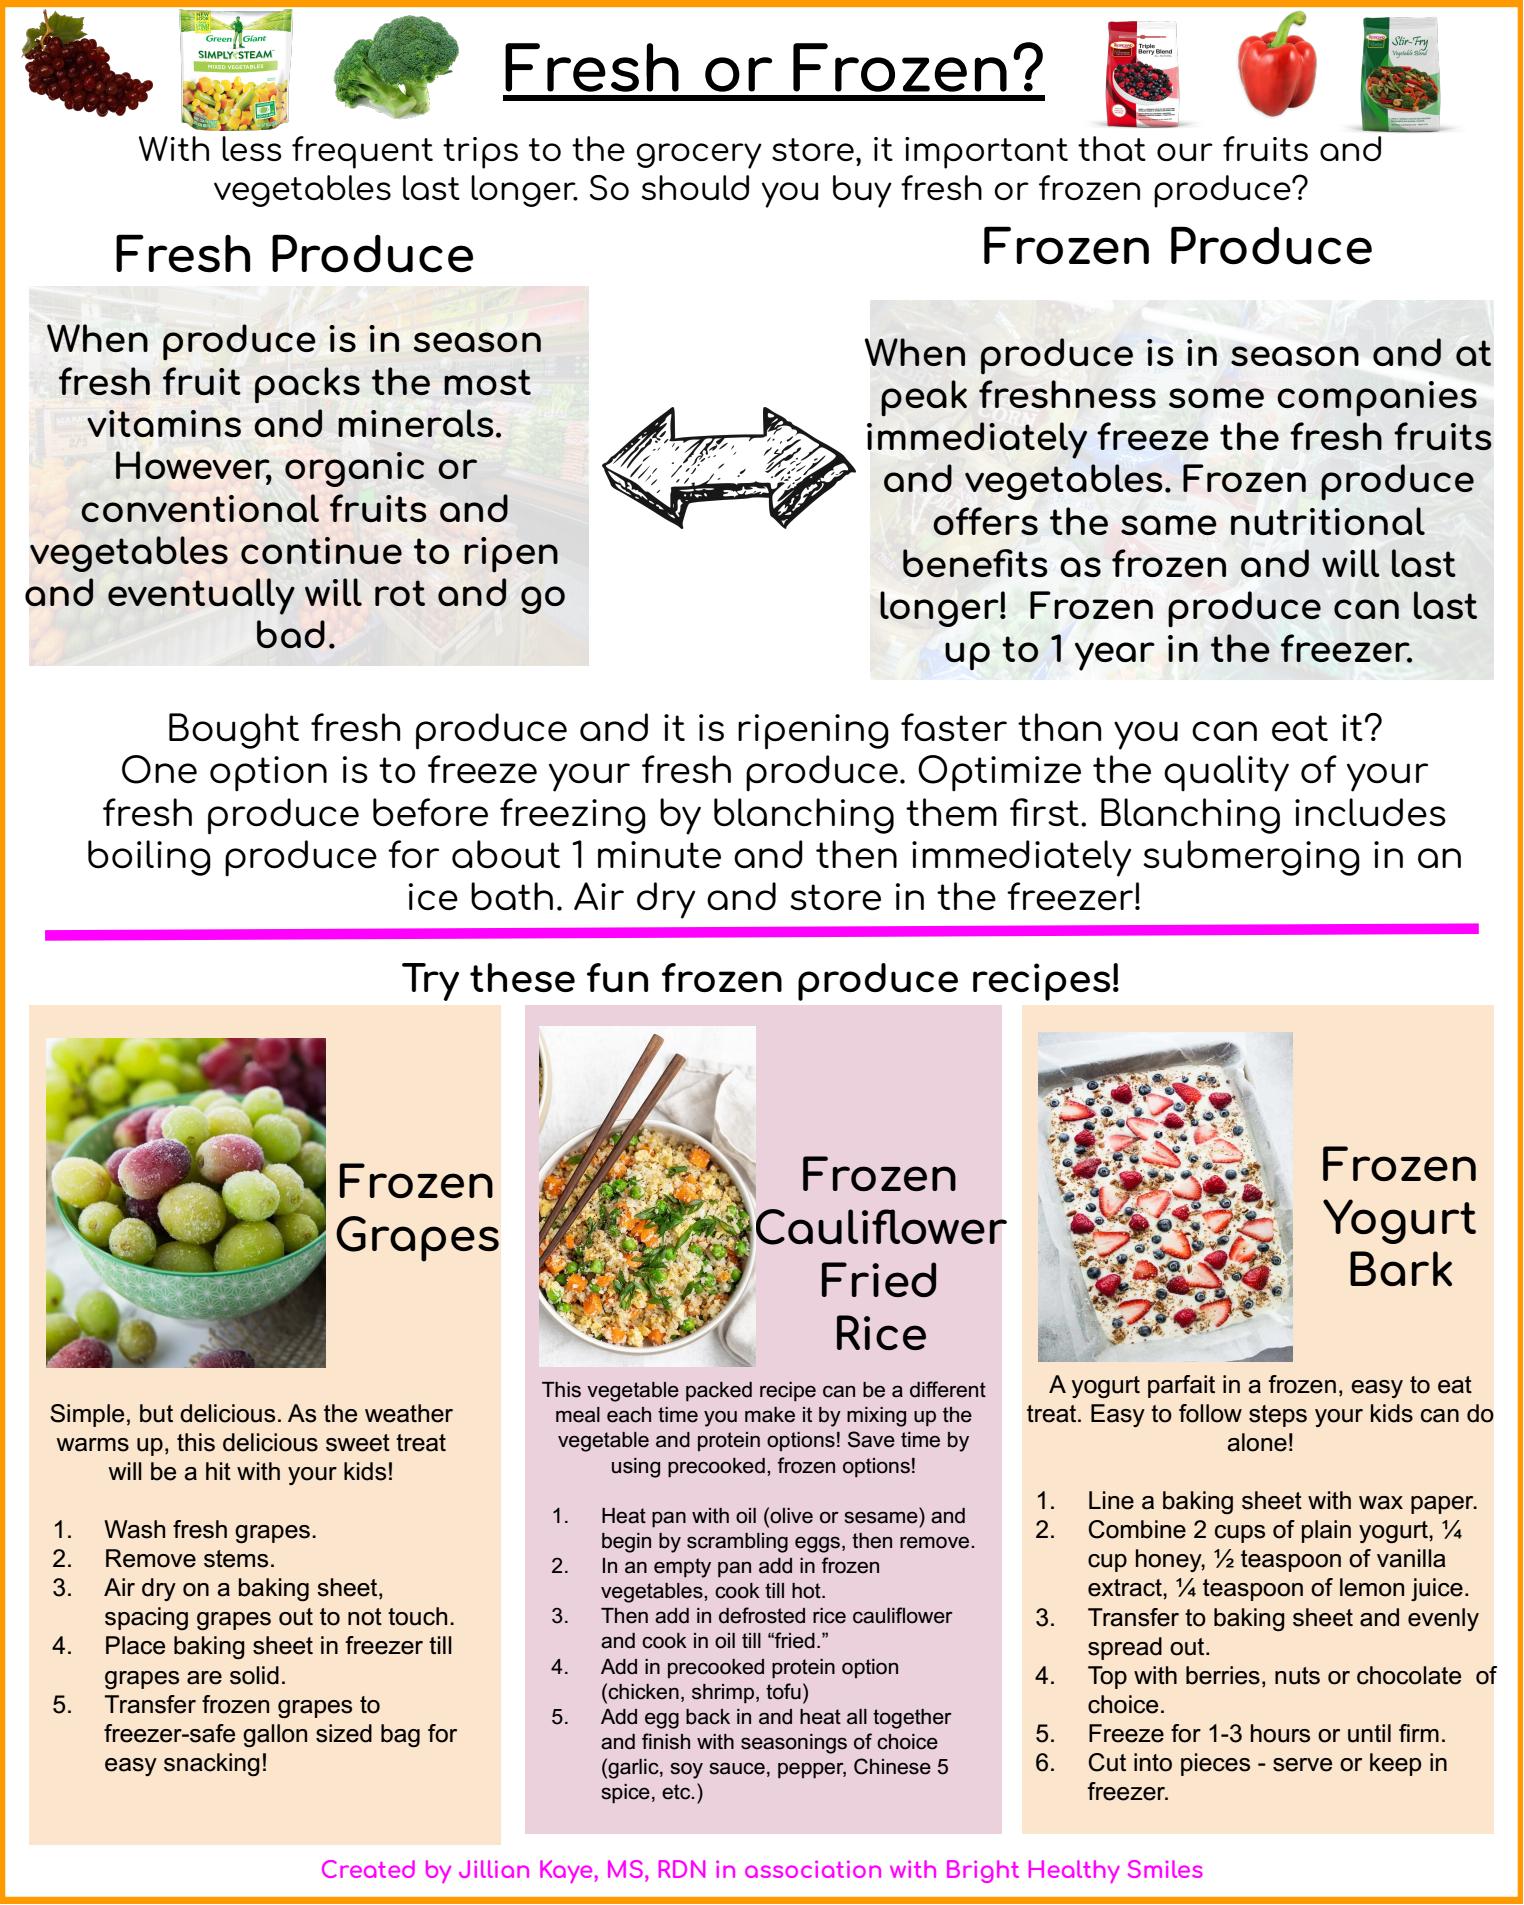 Fresh produce of Frozen produce